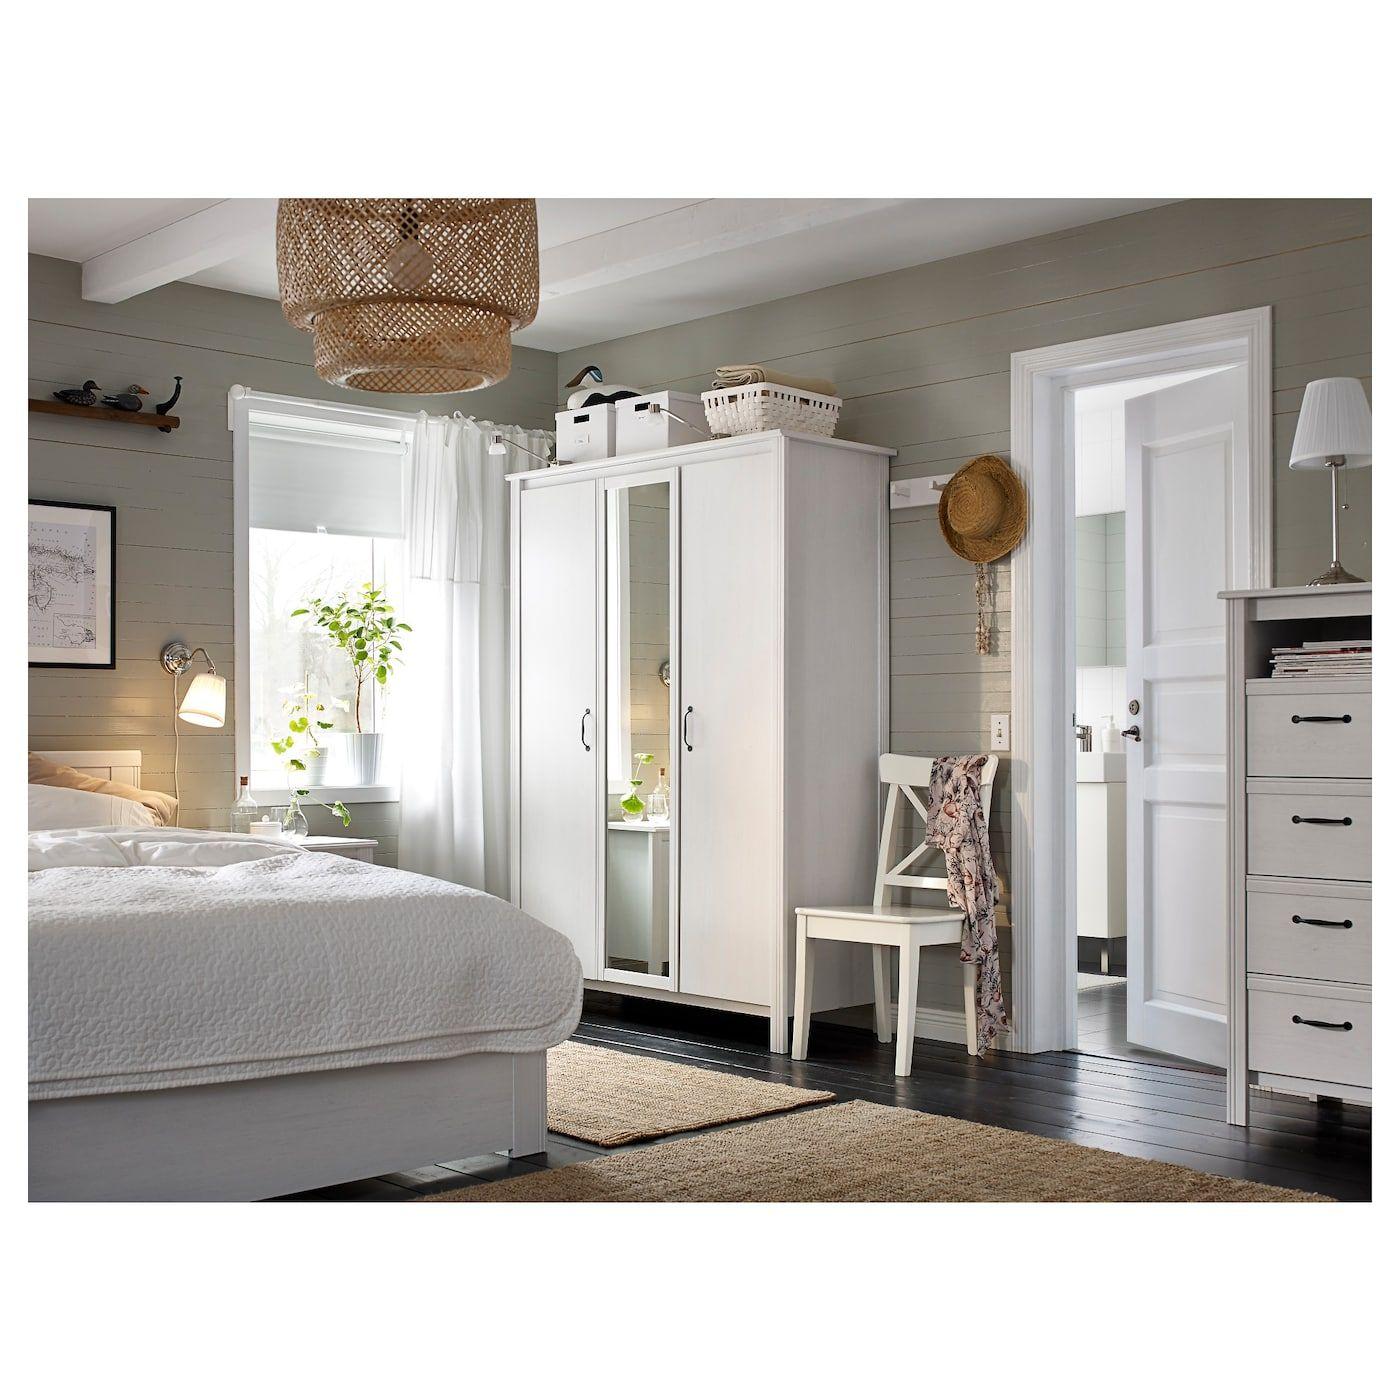 IKEA INGOLF Chair white White bedroom furniture